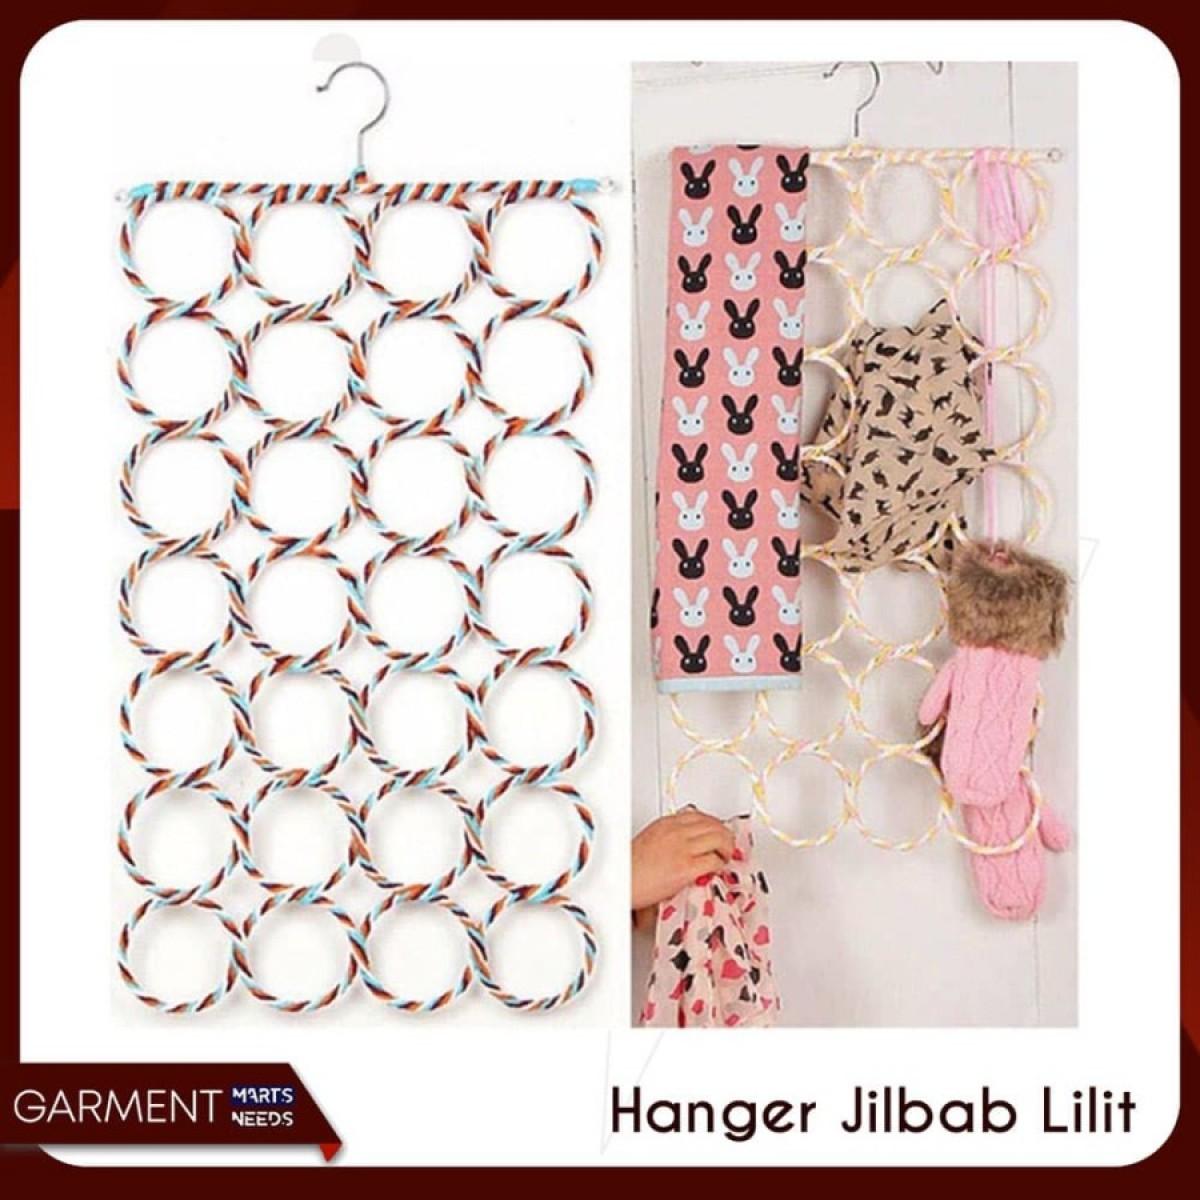 HANGER JILBAB SYAL 28 RING - Bunda Ina Shop